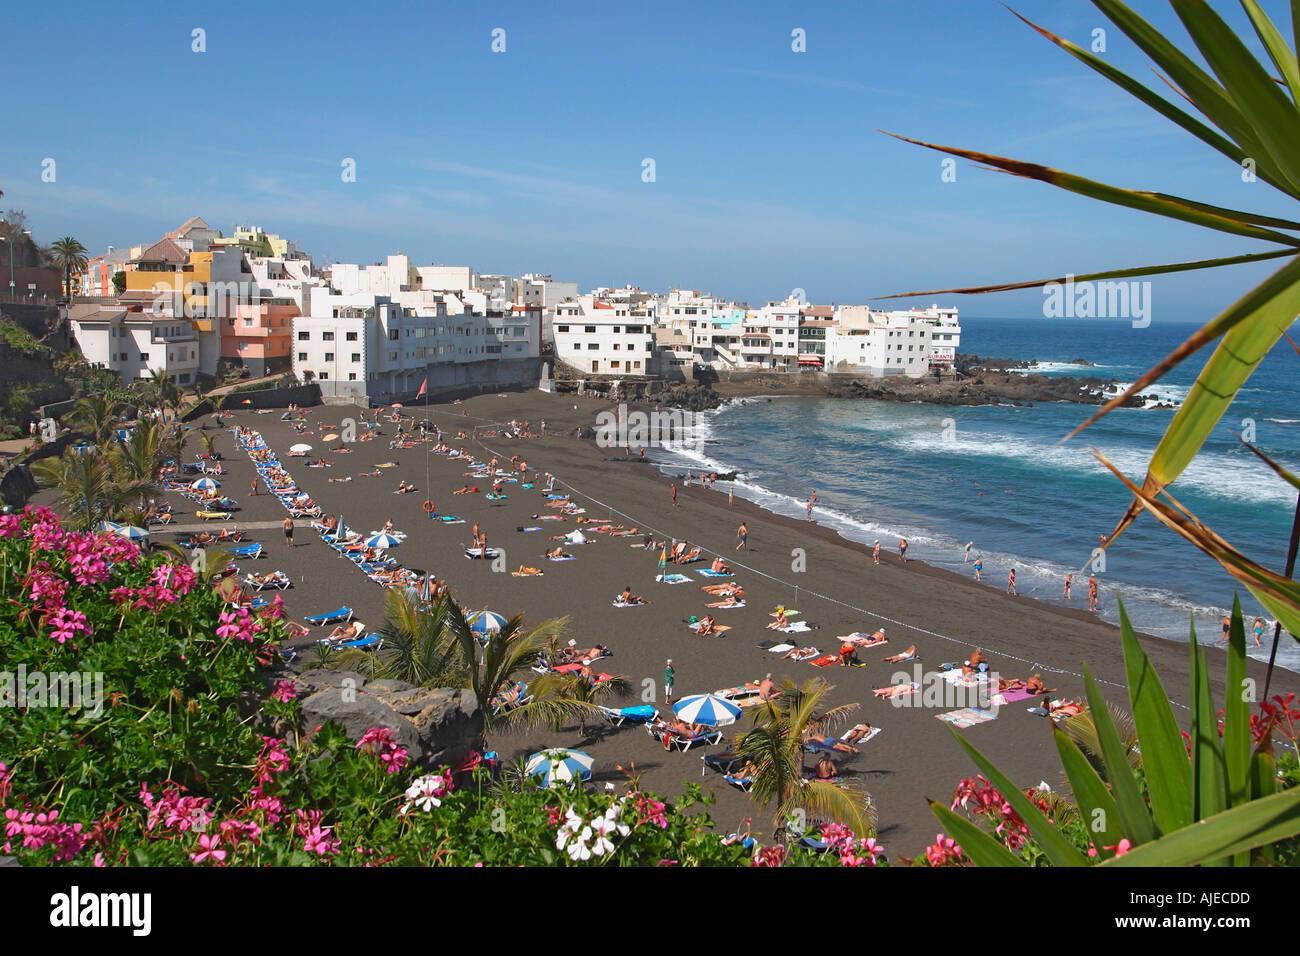 Playa jardin beach puerto de la cruz tenerife canary islands stock photo 1240284 alamy - Puerta de la cruz ...